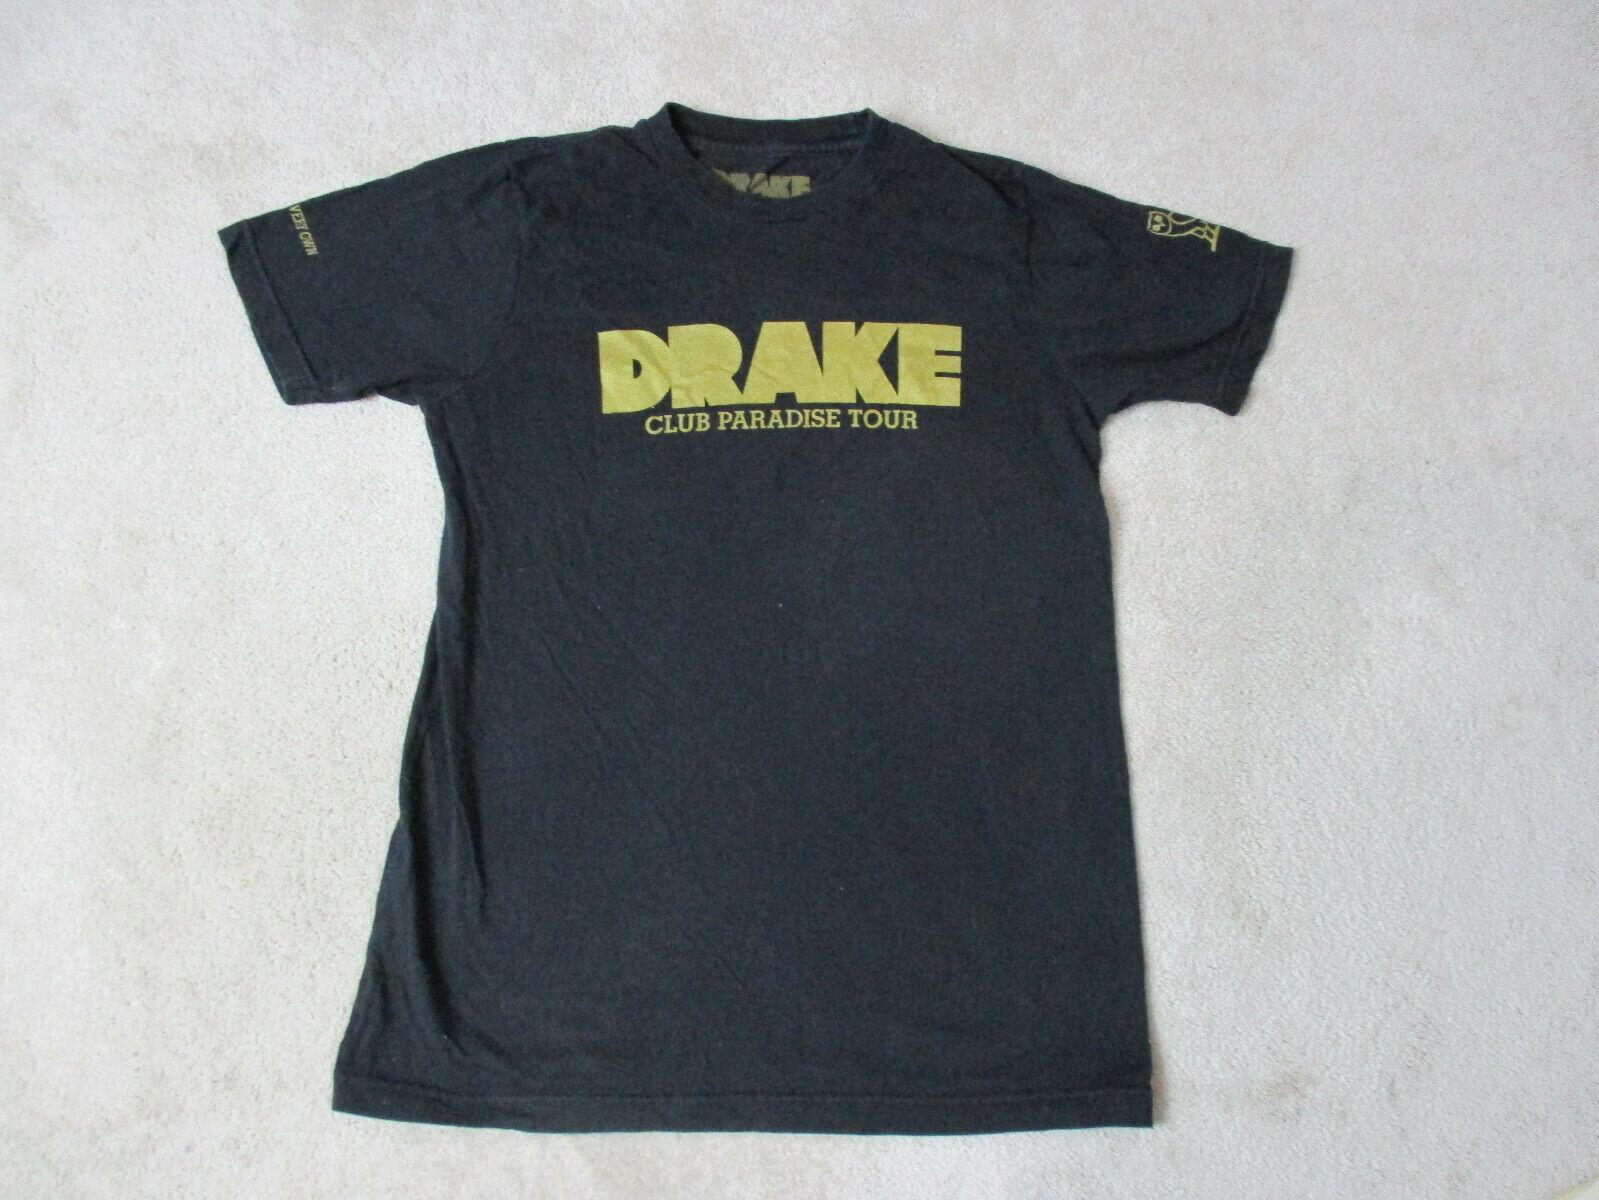 Drake Club Paradise Concerto Camisa Adulto Pequeno Ouro Negro Cash Money Rap Hip Hop Moda Unissex Camiseta top tee